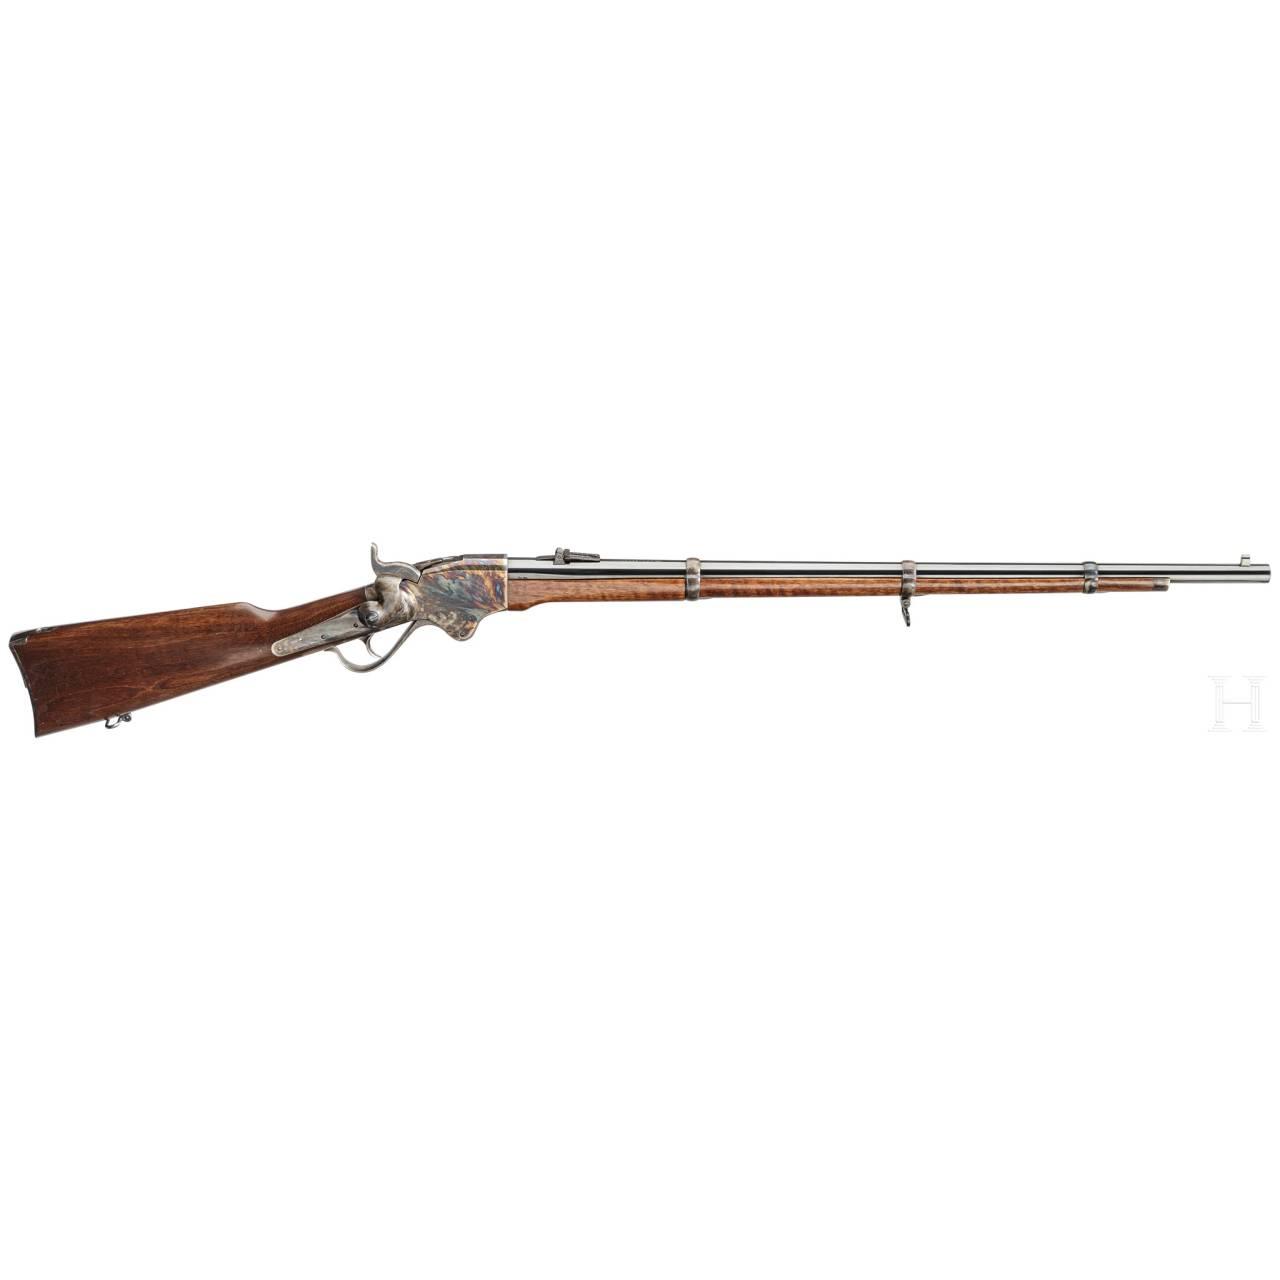 A Spencer Miliary Rifle M 1860 (Armi Sport, Italy)